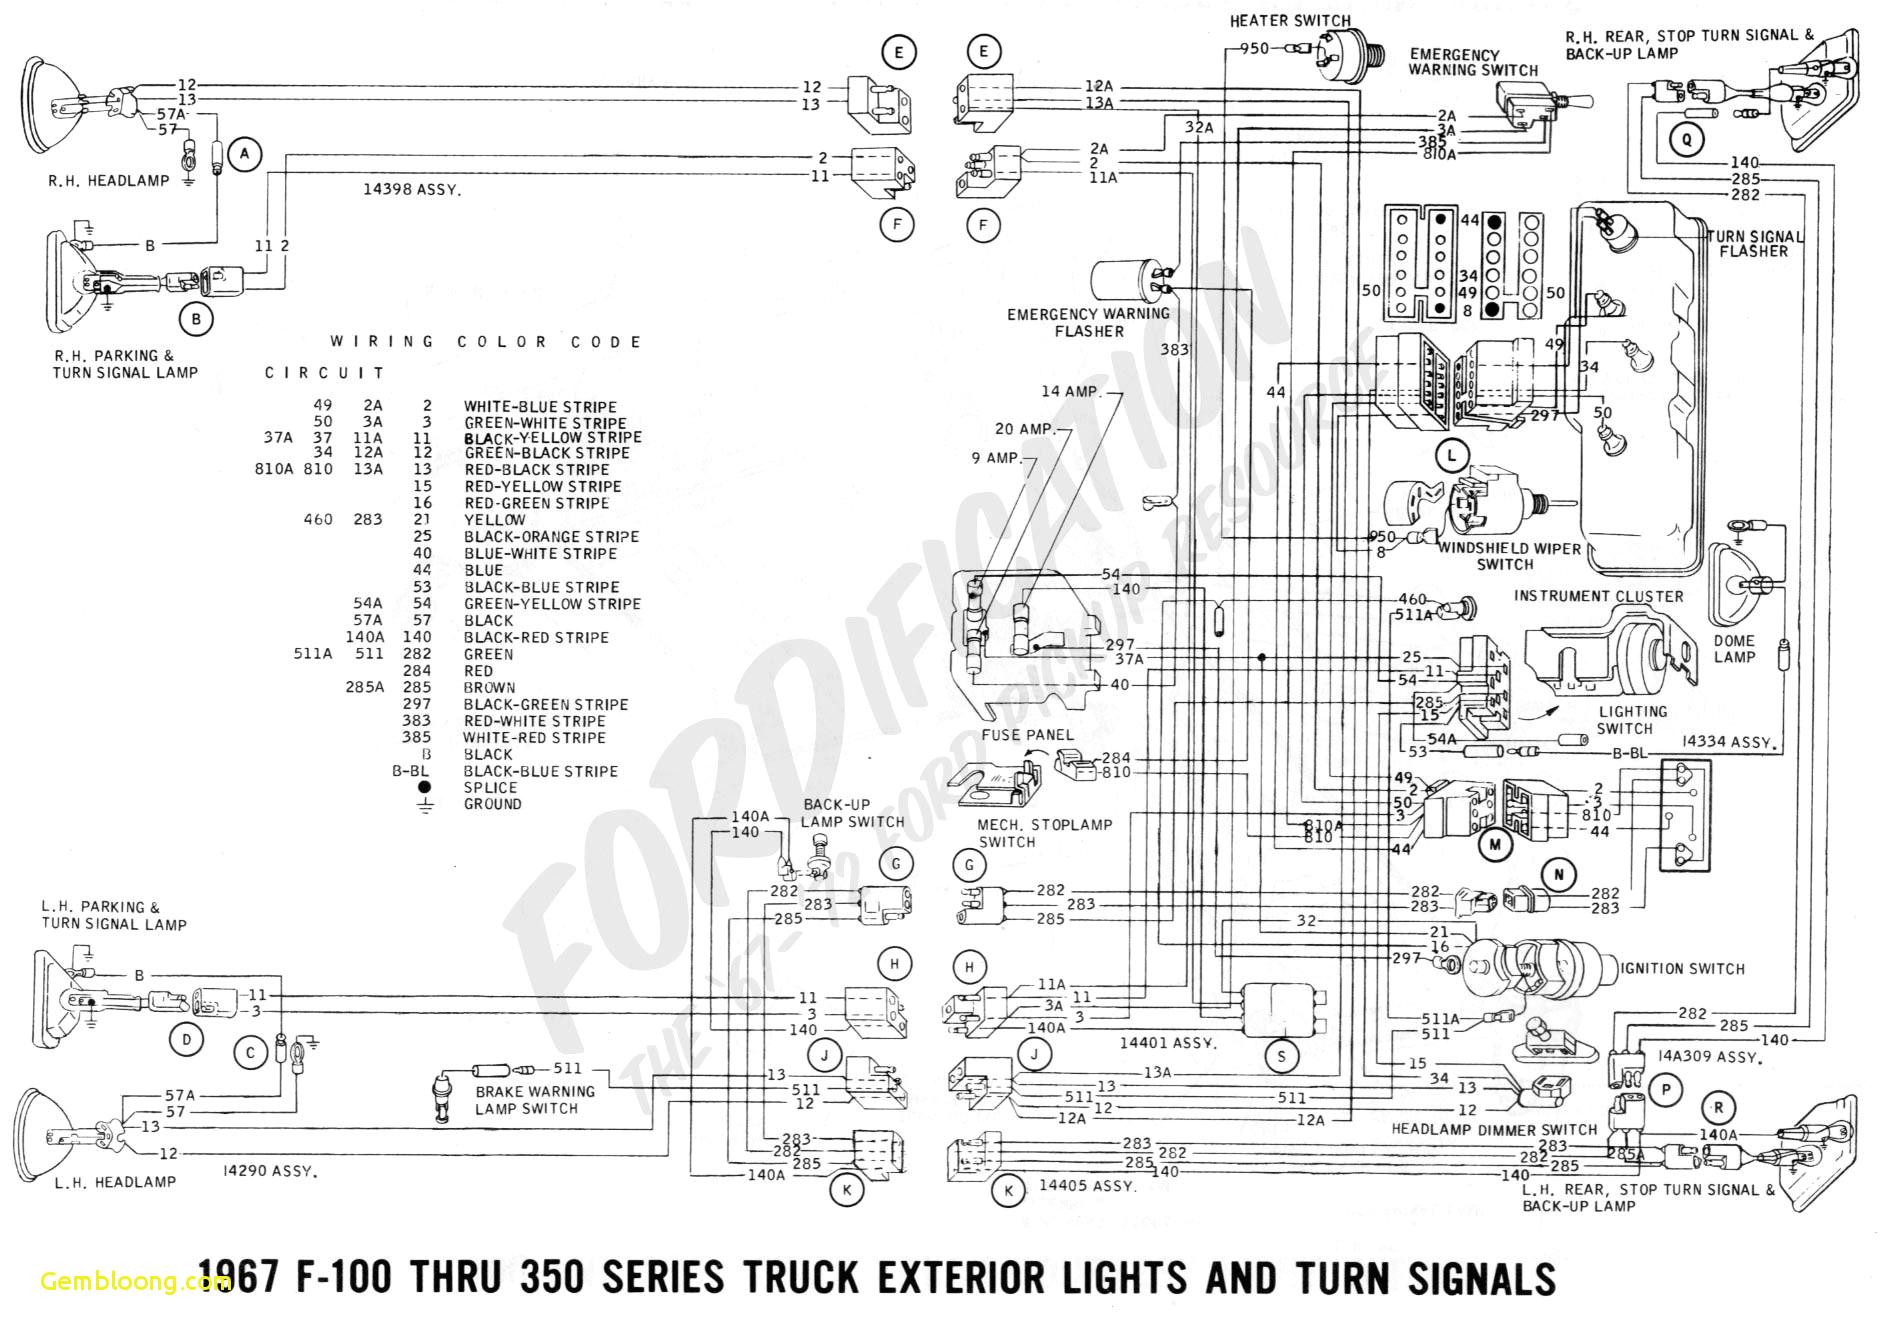 ford wiring diagrams free wiring diagram view volvo truck wiring diagrams free download ford truck wiring